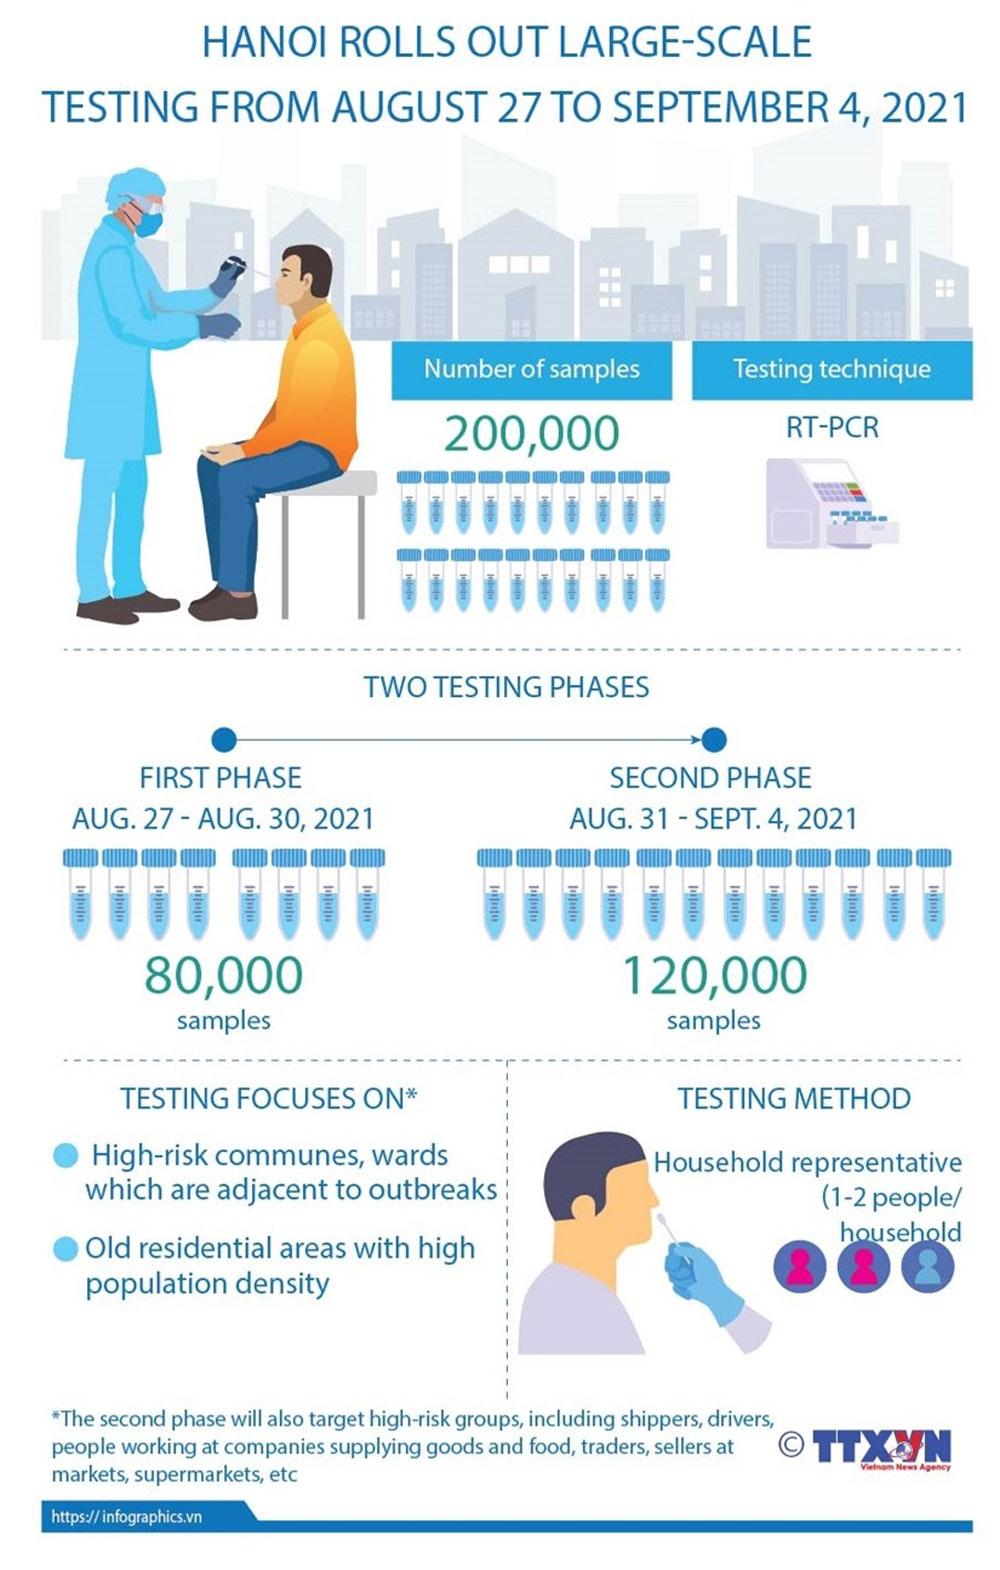 Hanoi, rolls out, large-scale coronavirus testing, Covid-19 pandemic, fight the epidemic, community transmission